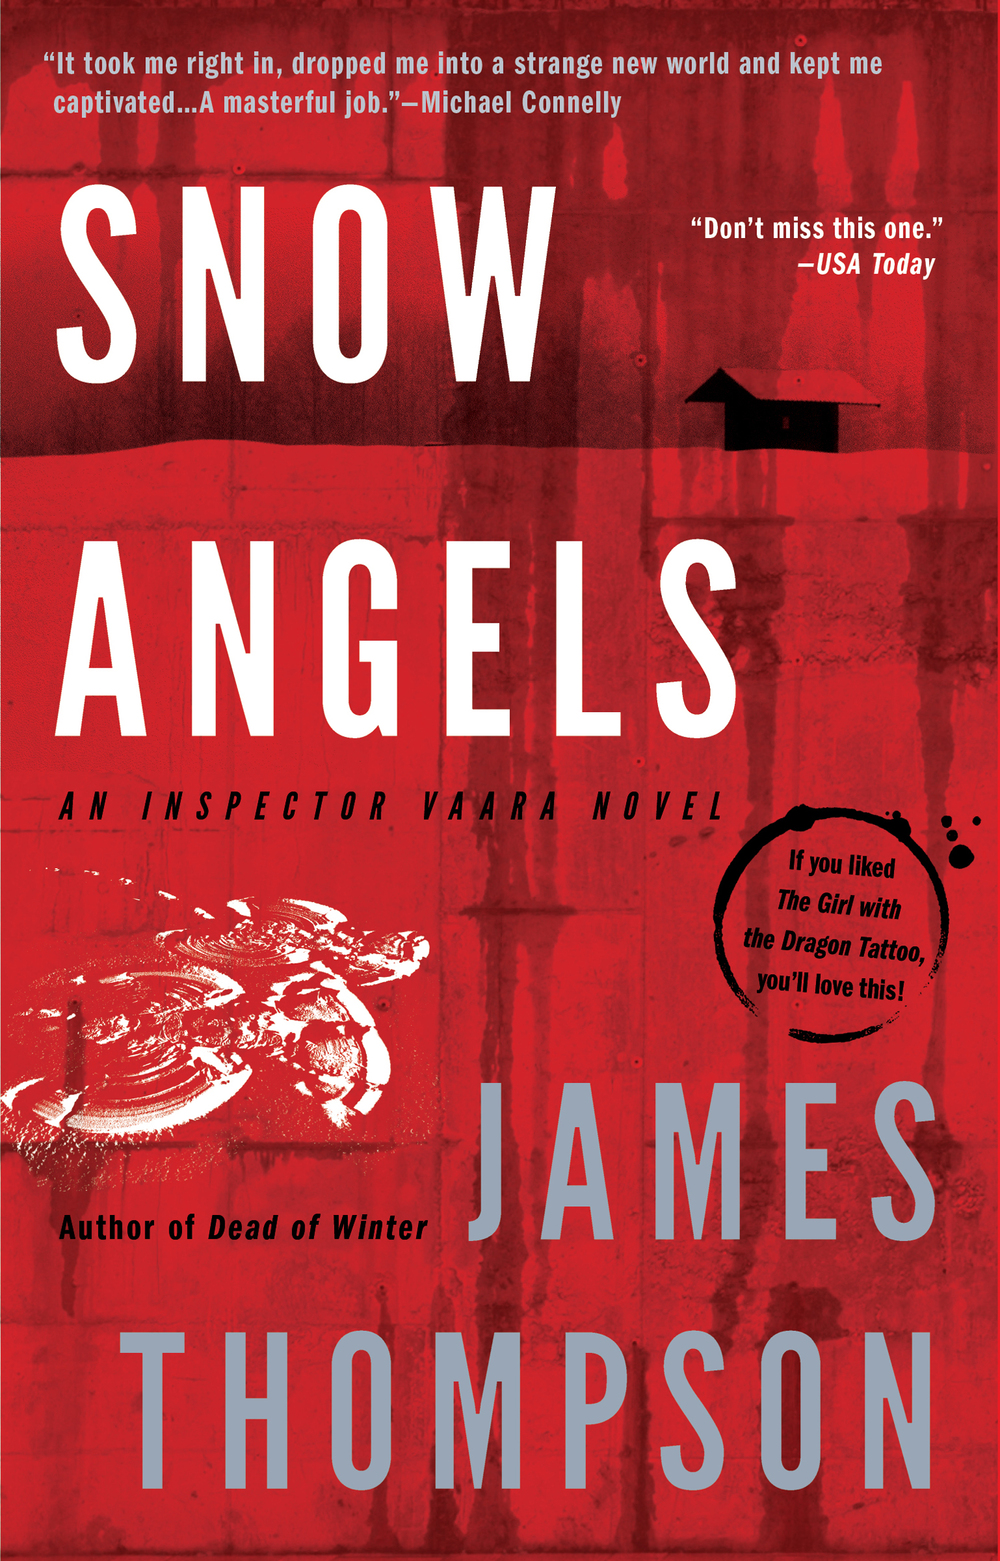 SNOW-ANGELS-tpb-ss6.jpg